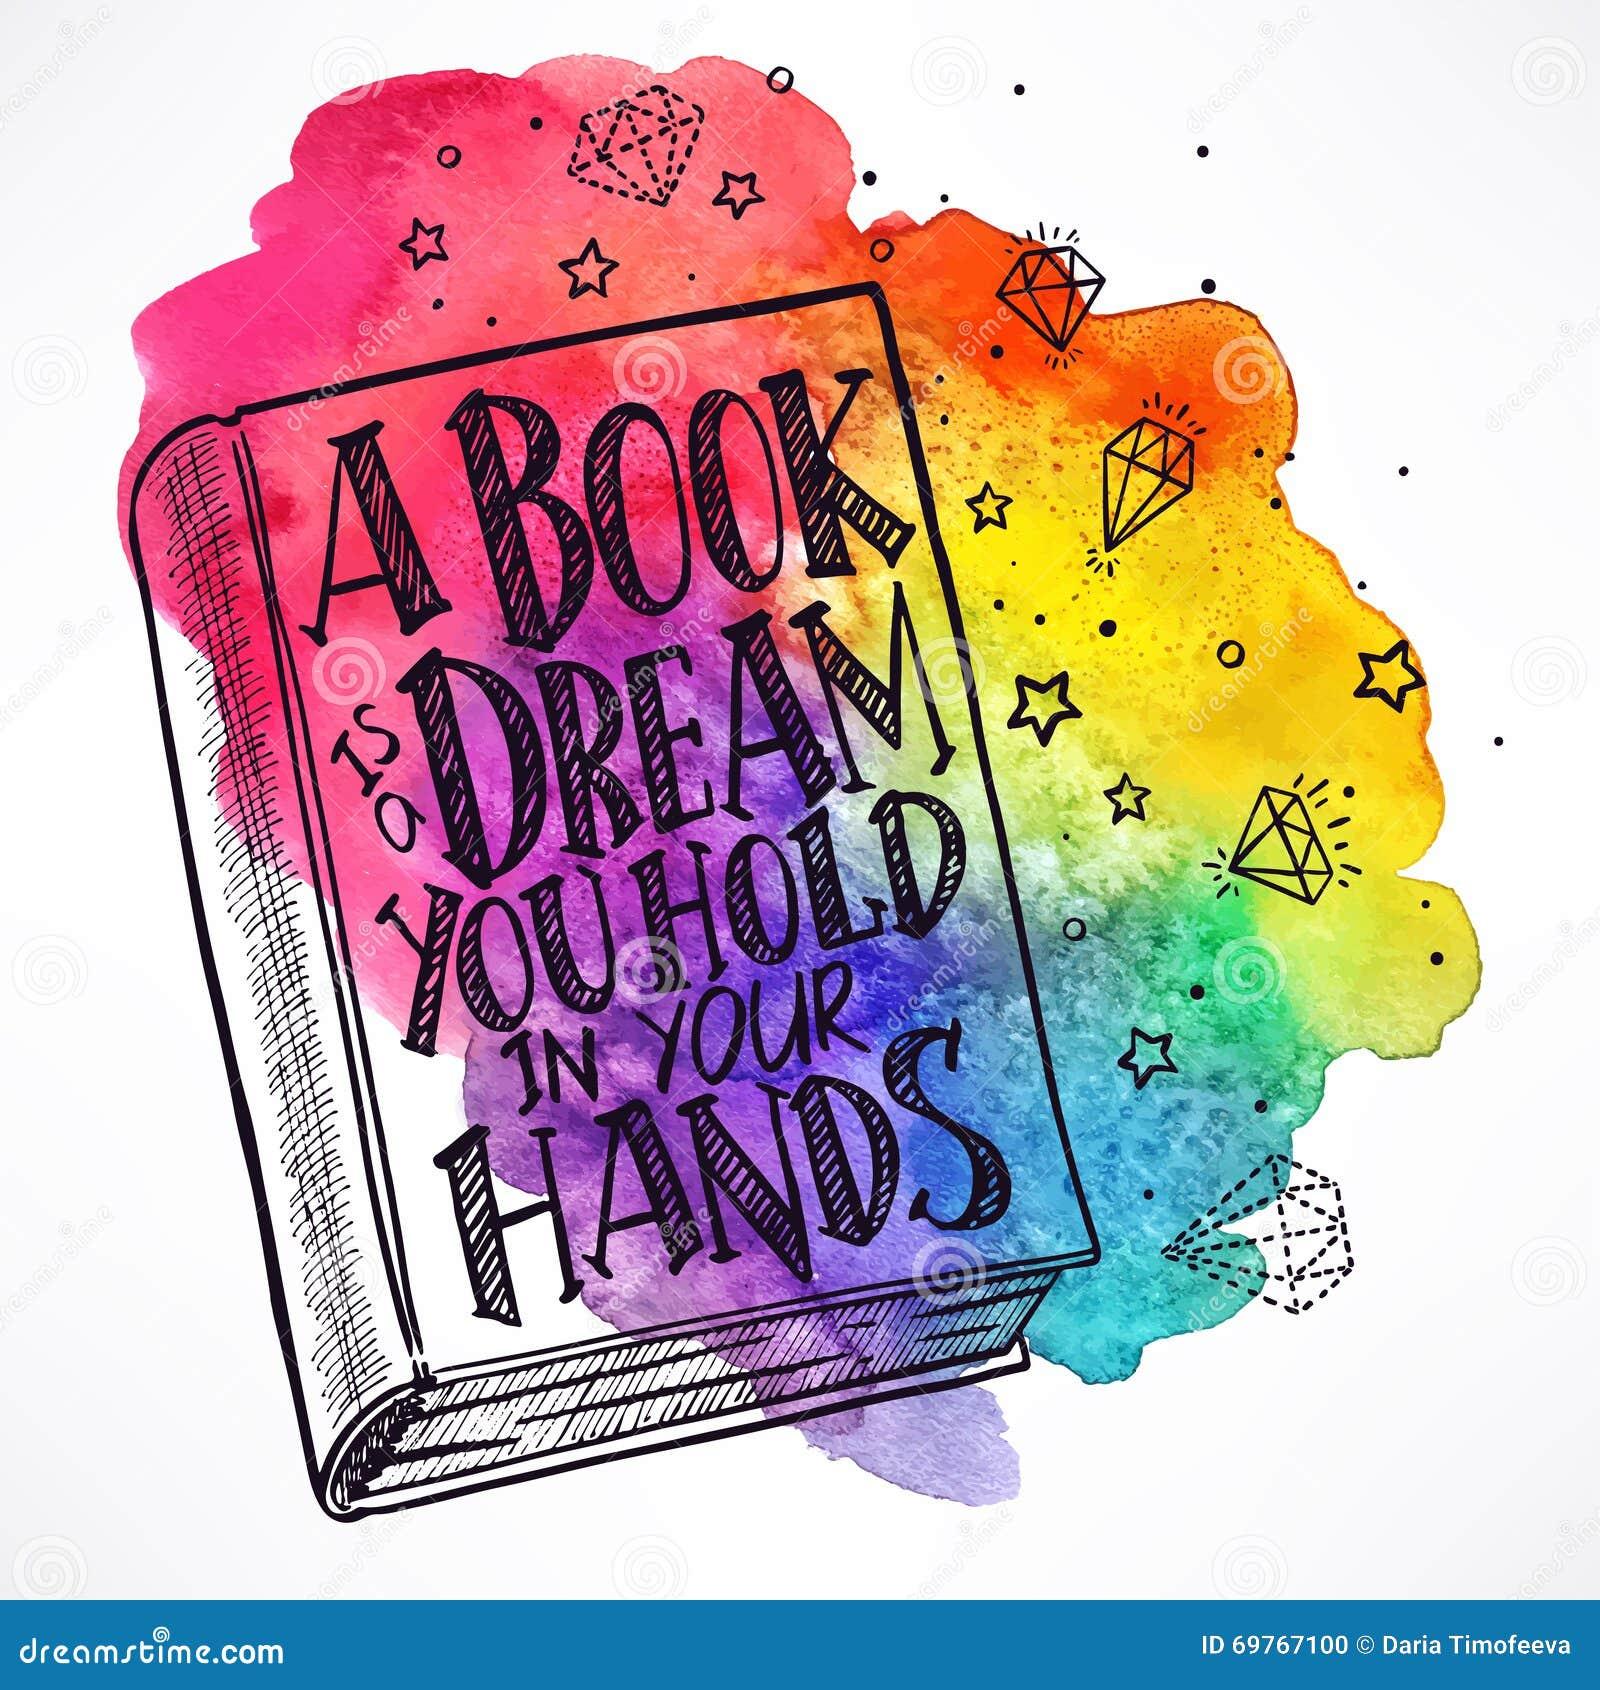 Hand-drawn βιβλίο σε ένα υπόβαθρο watercolor